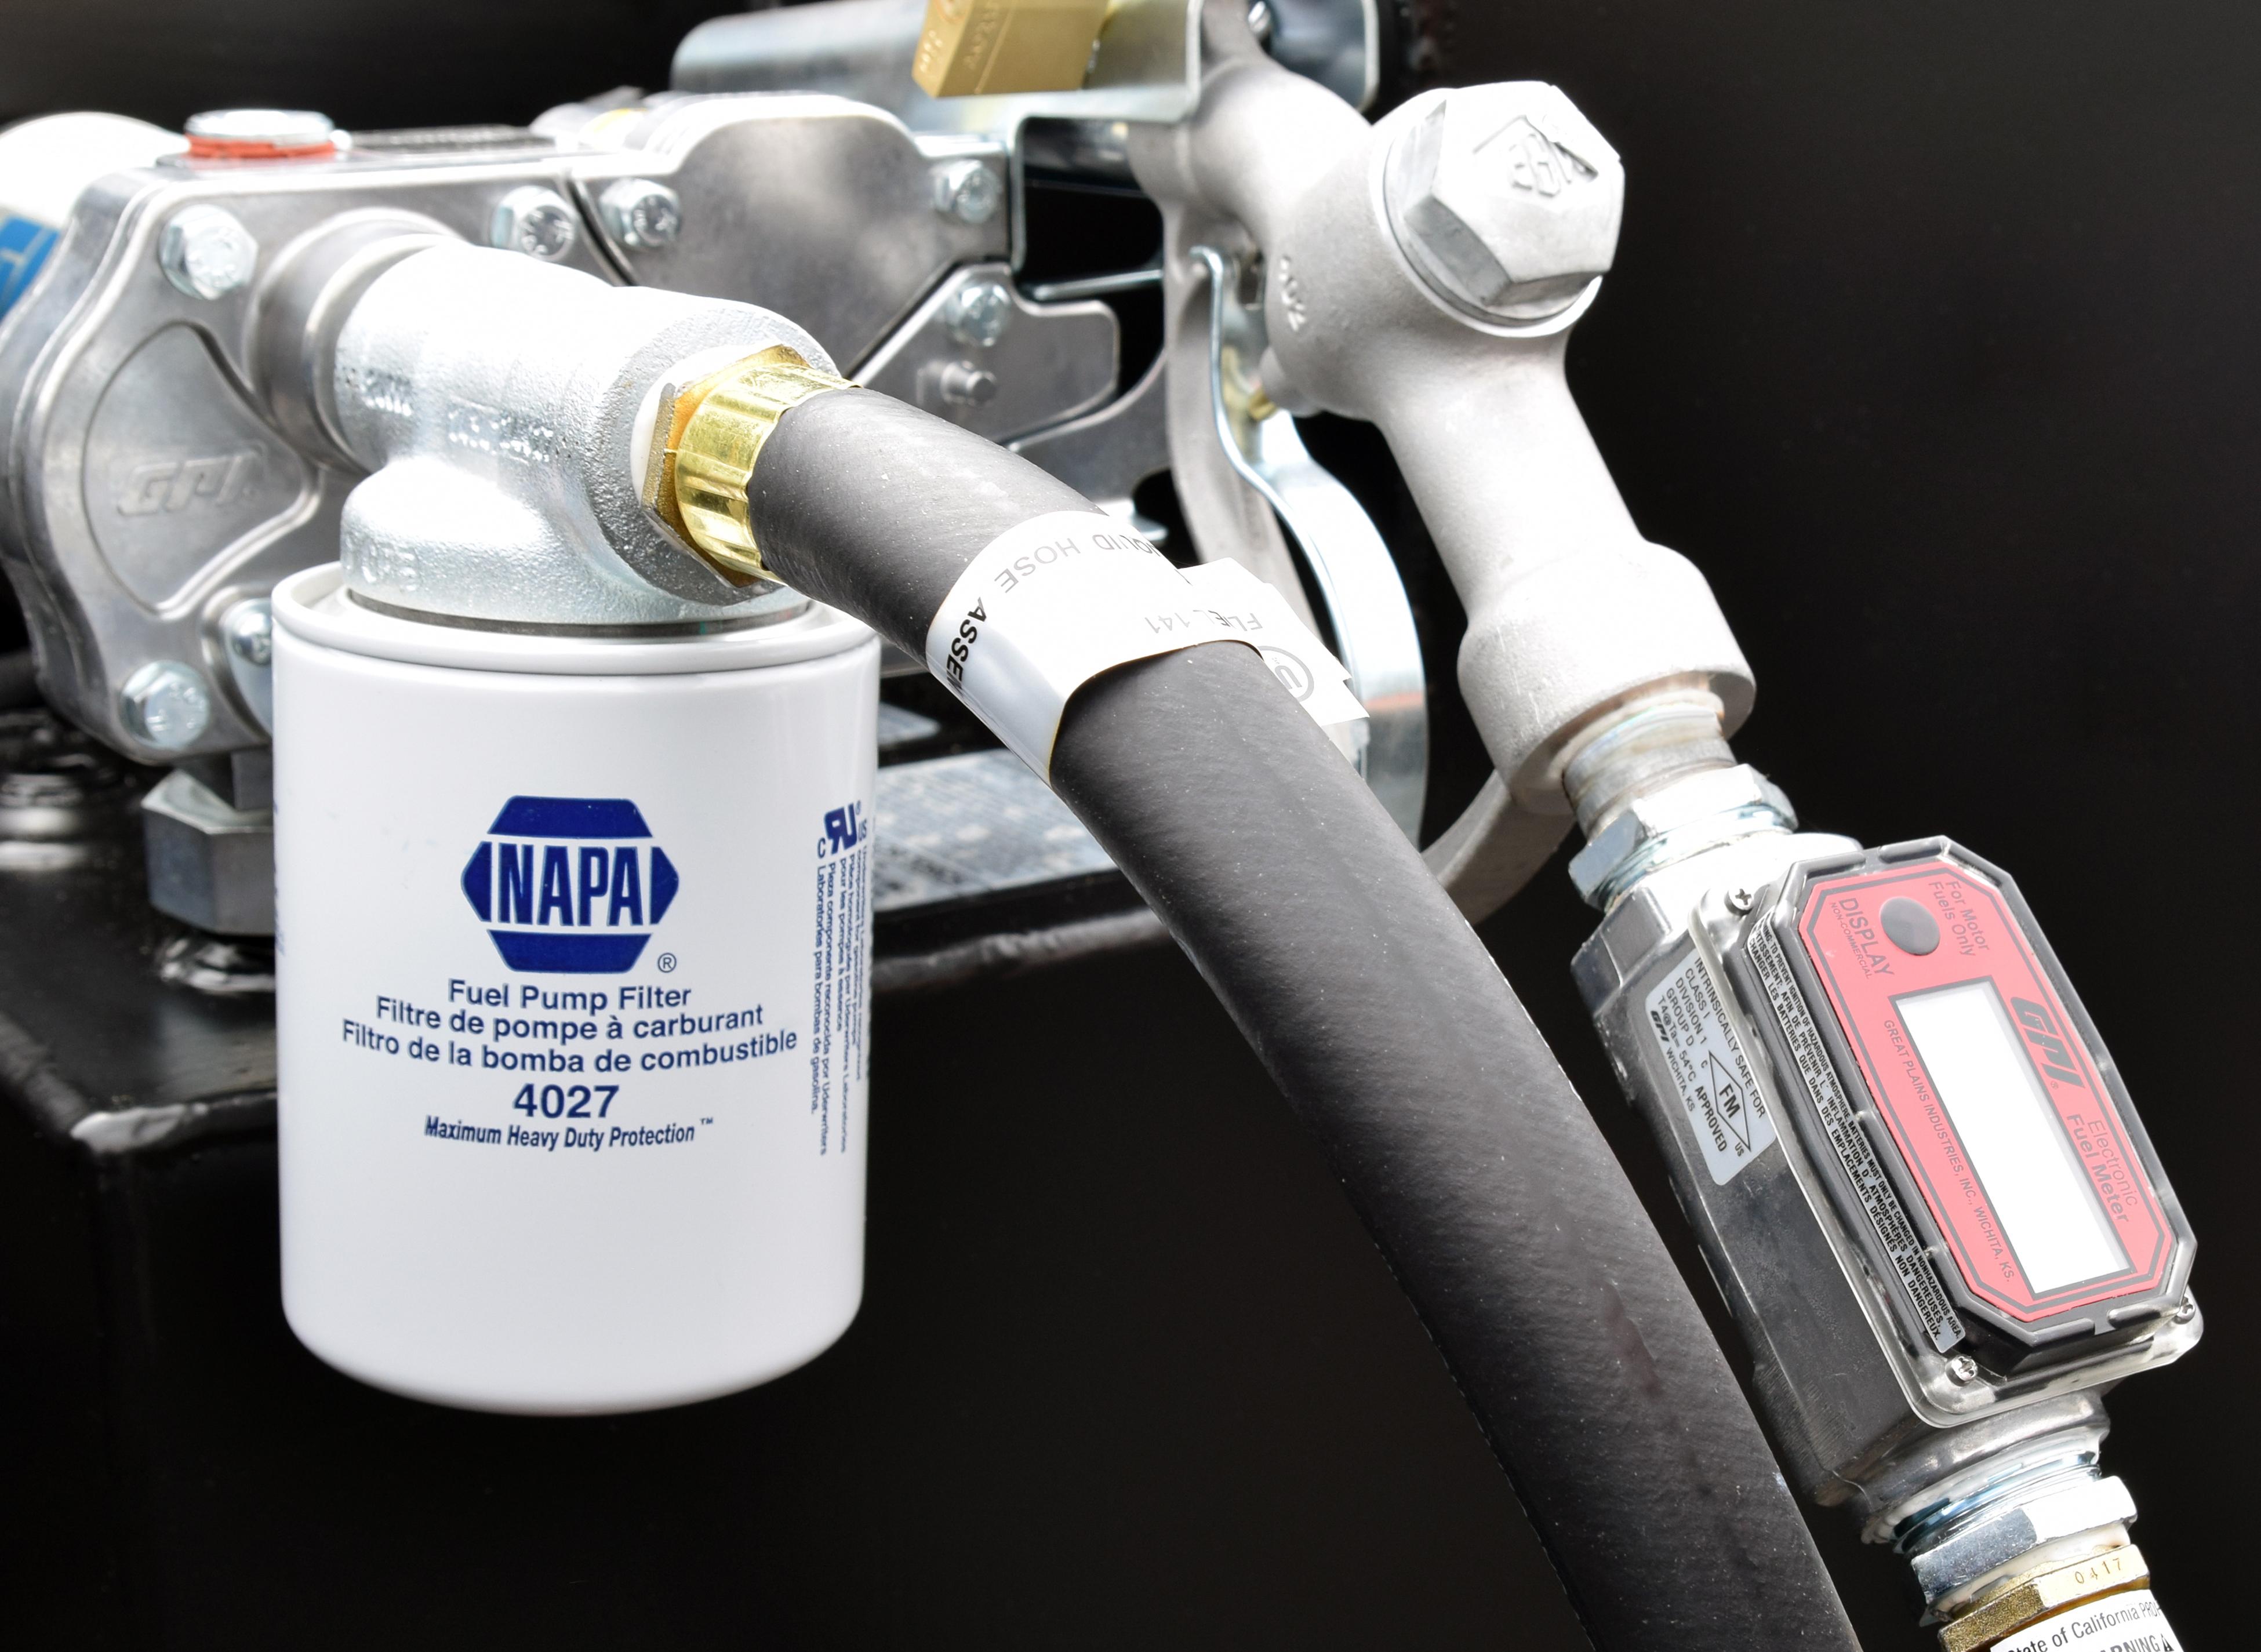 transfer fuel filter kit wiring librarynapa in line fuel filter kit for refueling tank transfer flow, inc